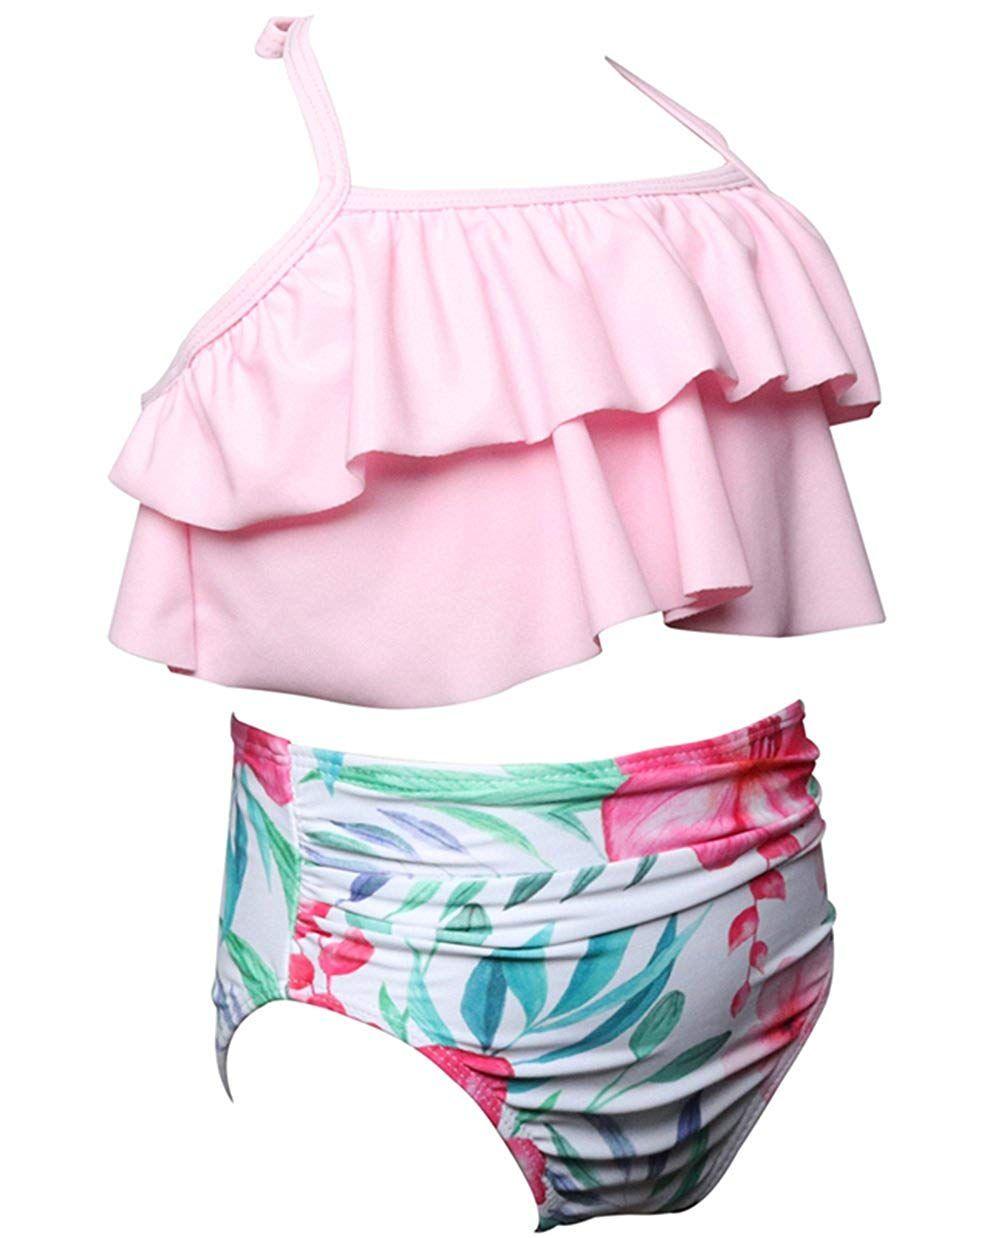 0bebdf2b11 2Pcs Mommy and Me Matching Family Swimsuit Ruffle Women Swimwear Kids  Children Toddler Bikini Bathing Suit Beachwear Sets #Ad #Ruffle,  #AFFILIATE, ...